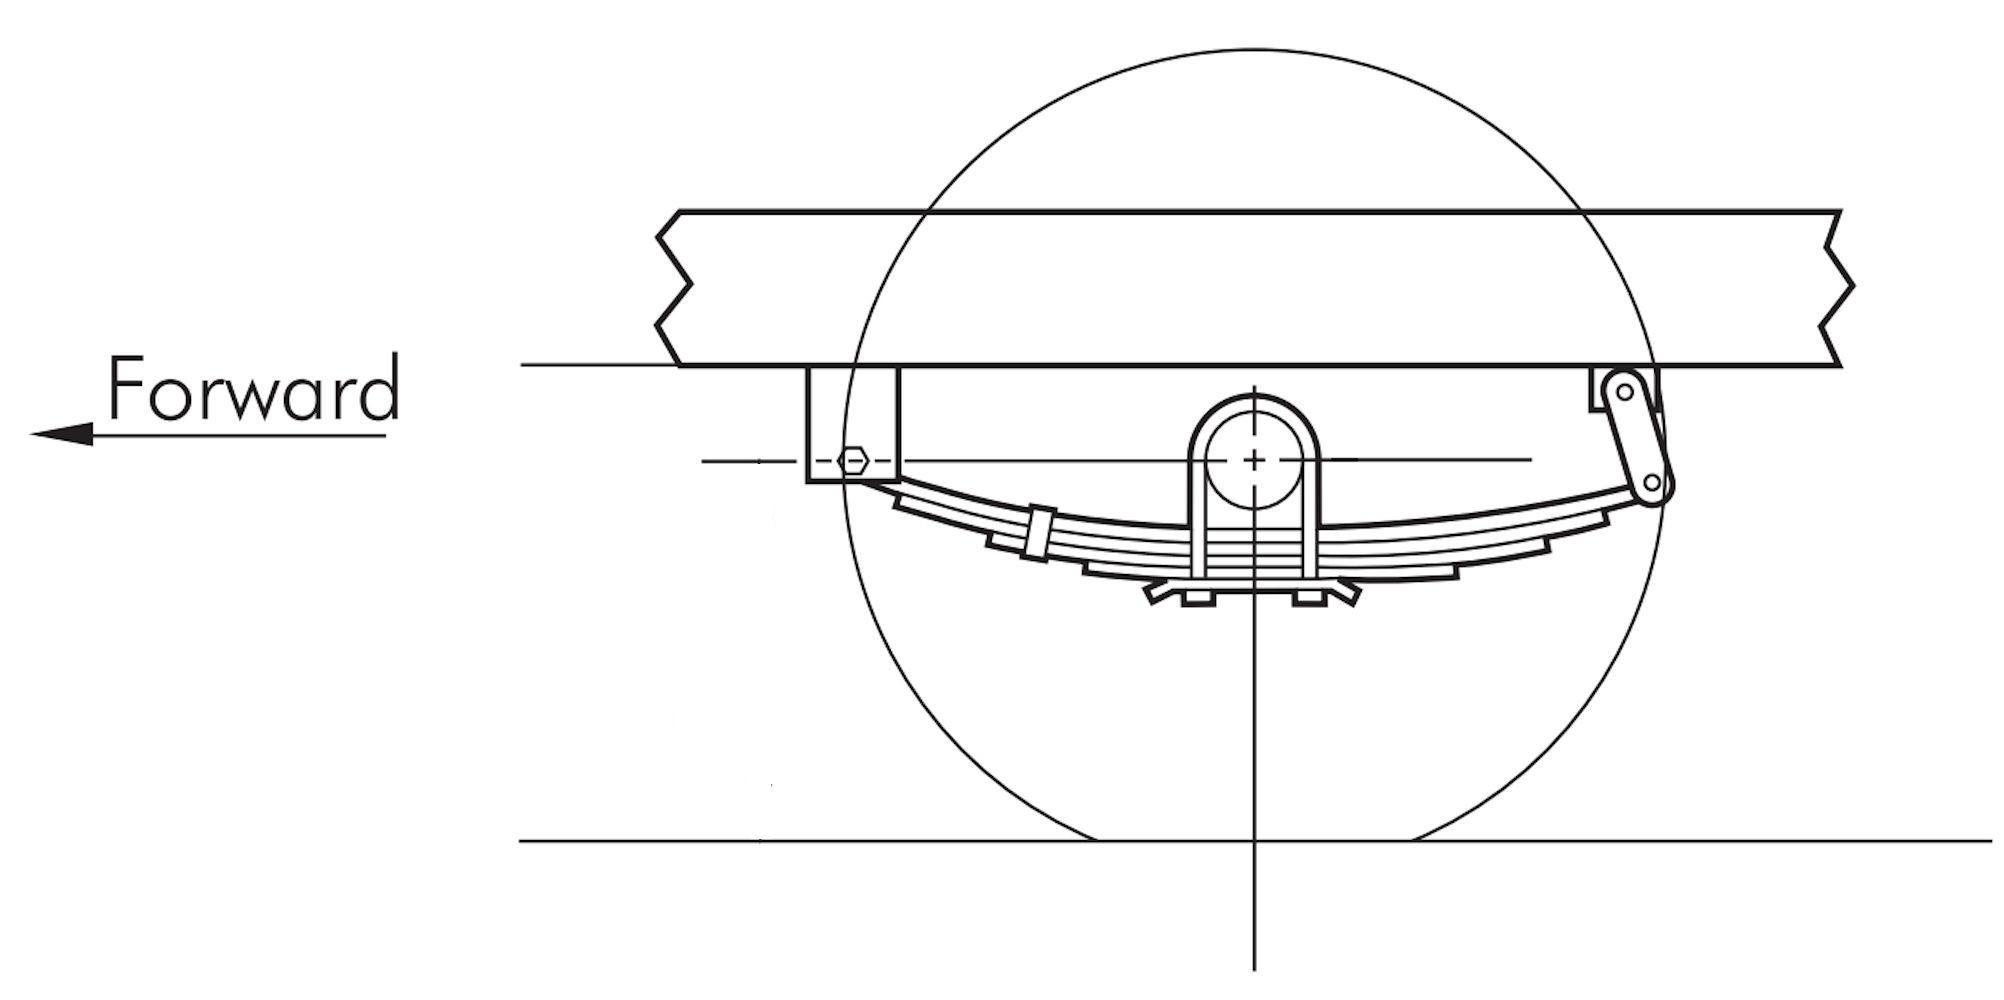 Leaf Spring Parts Diagram 23 1 4 In Double Eye 3 Leaf Trailer Spring 1750lb Capacity Of Leaf Spring Parts Diagram